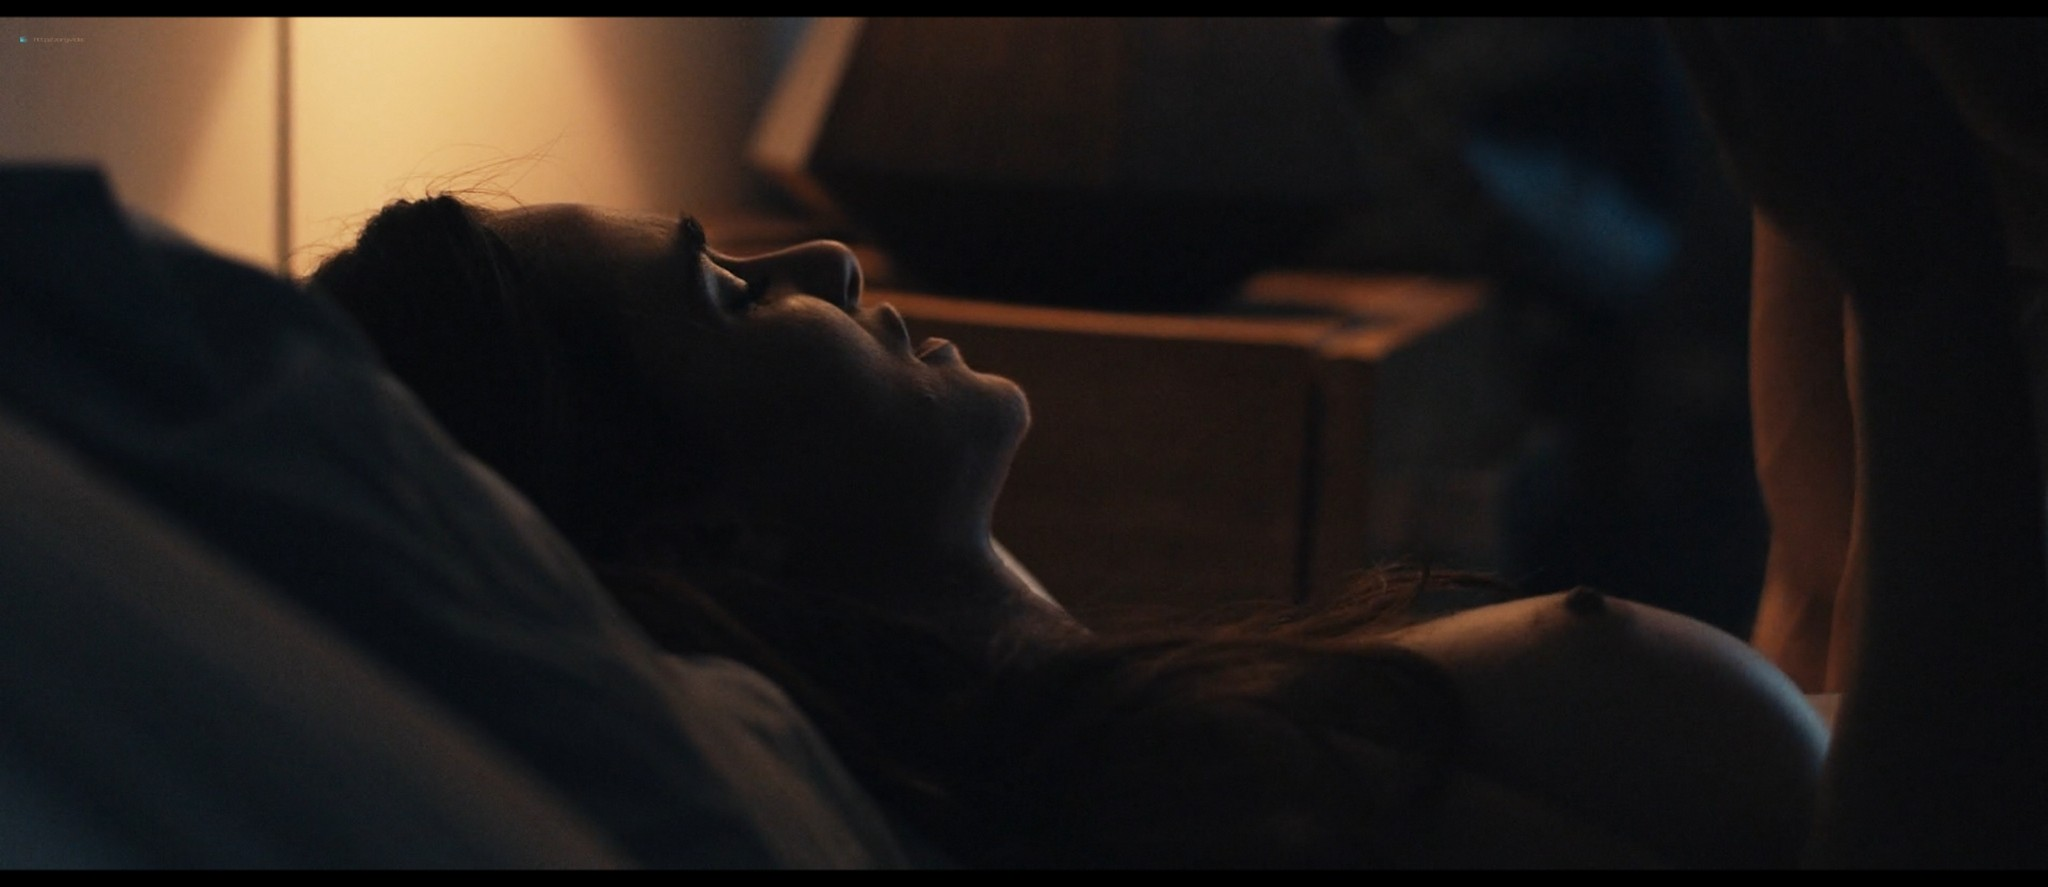 Alicia Sanz nude hot sex - En Brazos de un sesino (2019) HD 1080p Web (9)